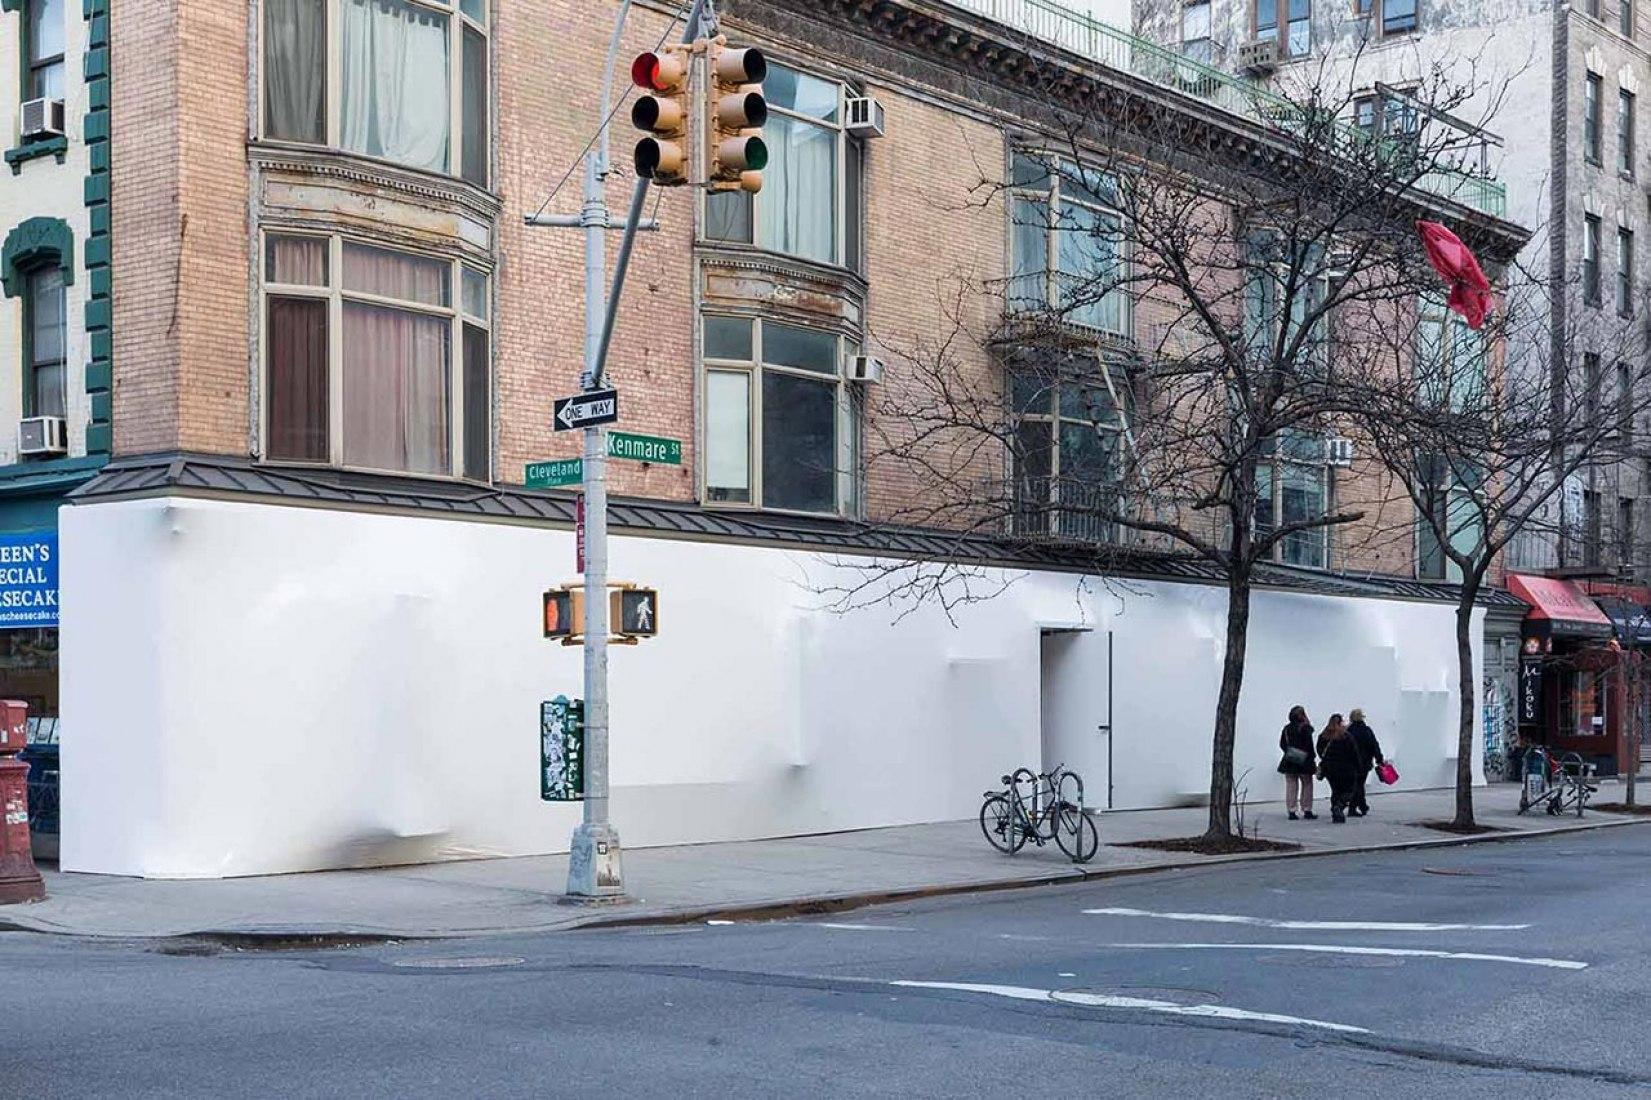 Blueprint. Storefront for Art and Architecture. Comisariado por Sebastiaan Bremer y Florian Idenburg & Jing Liu of SO-IL. Fotografía © Iwan Baan / Storefront.